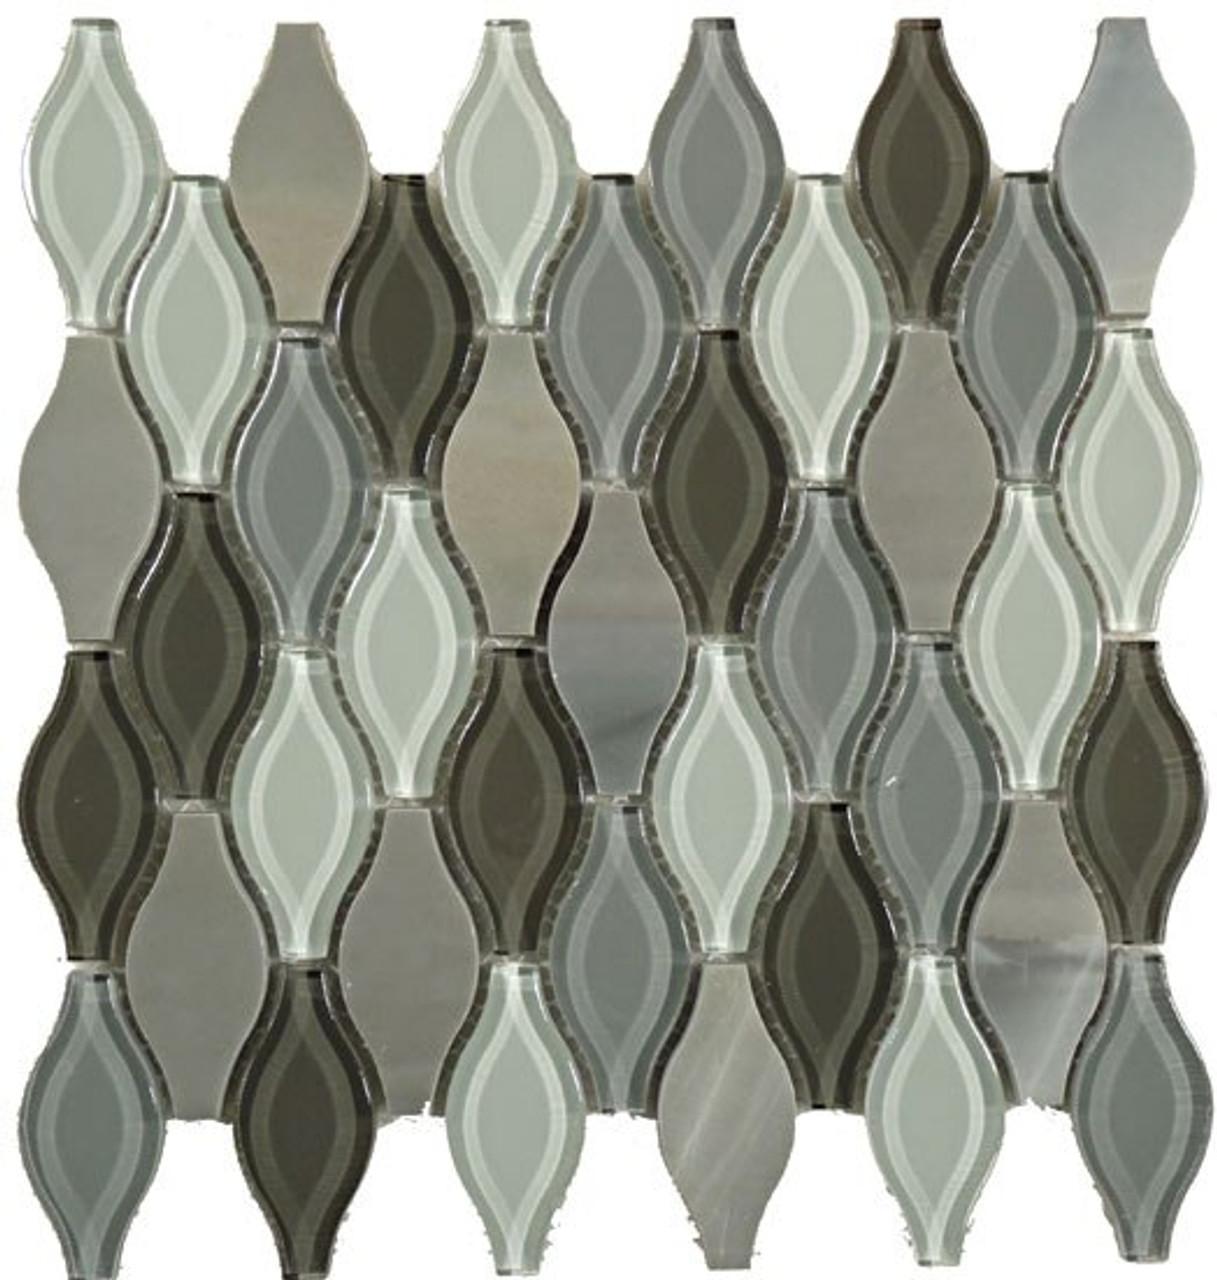 Bella Glass Tiles Seagull Series Polar Grey